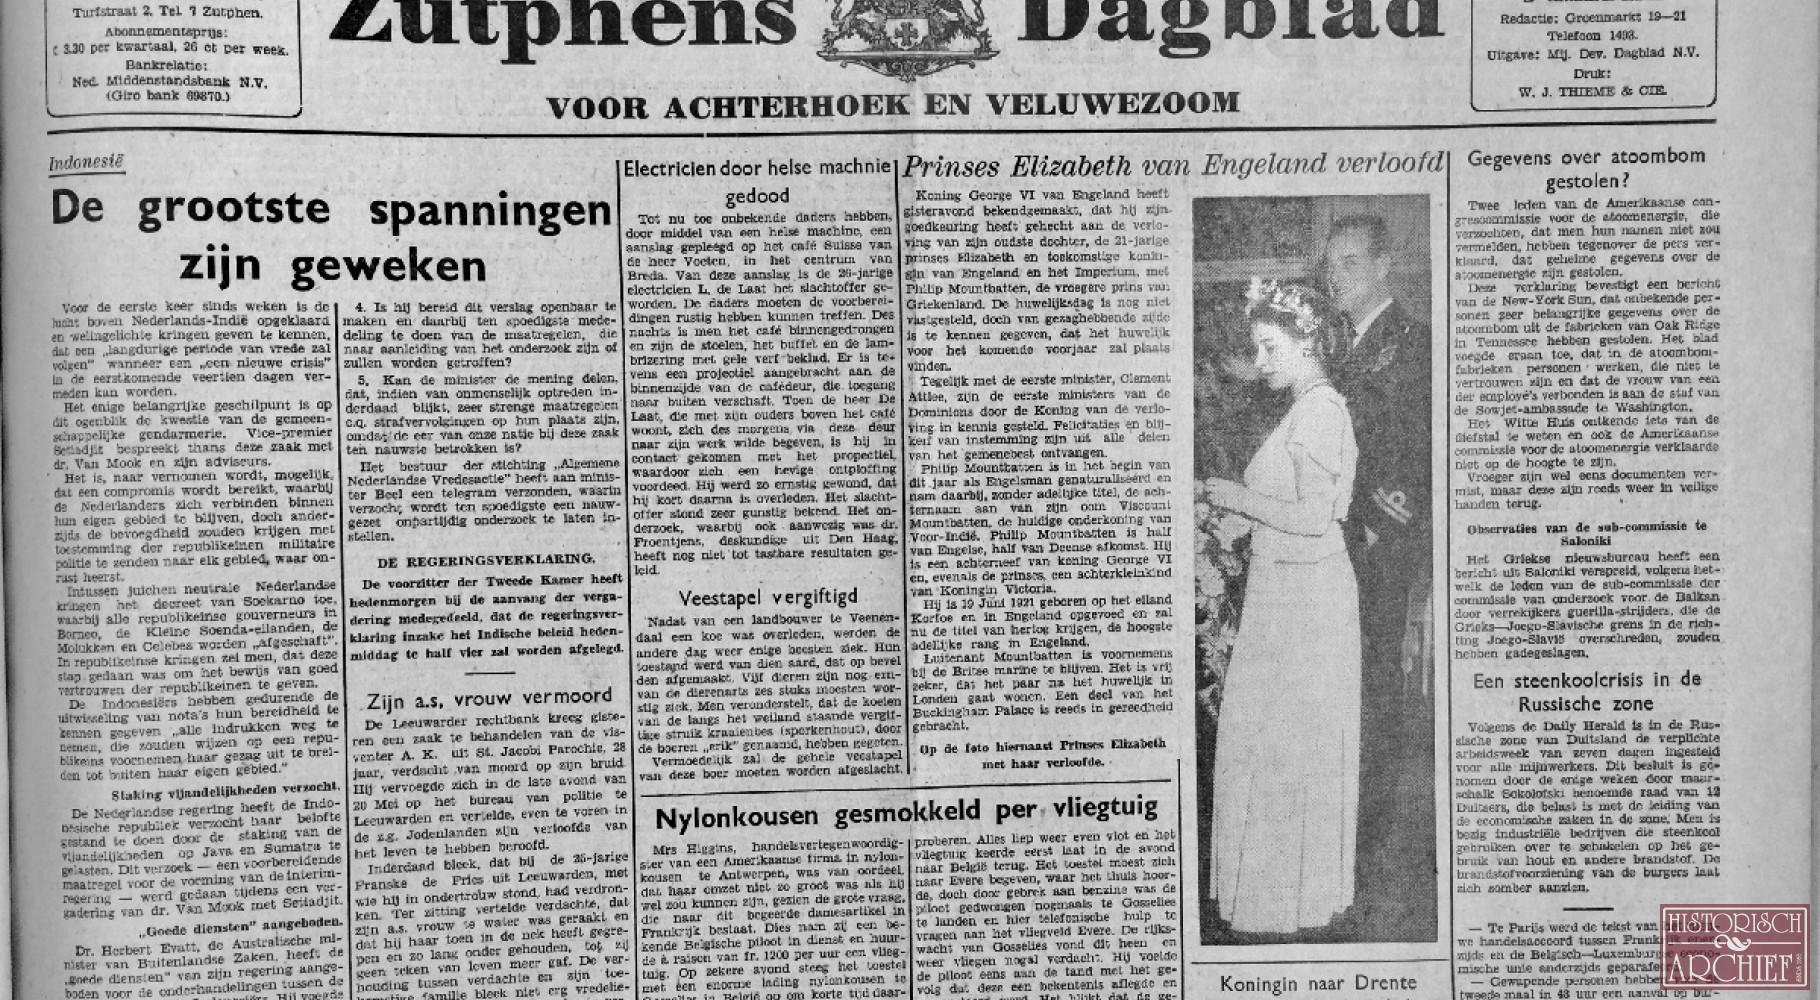 Zutphens dagblad